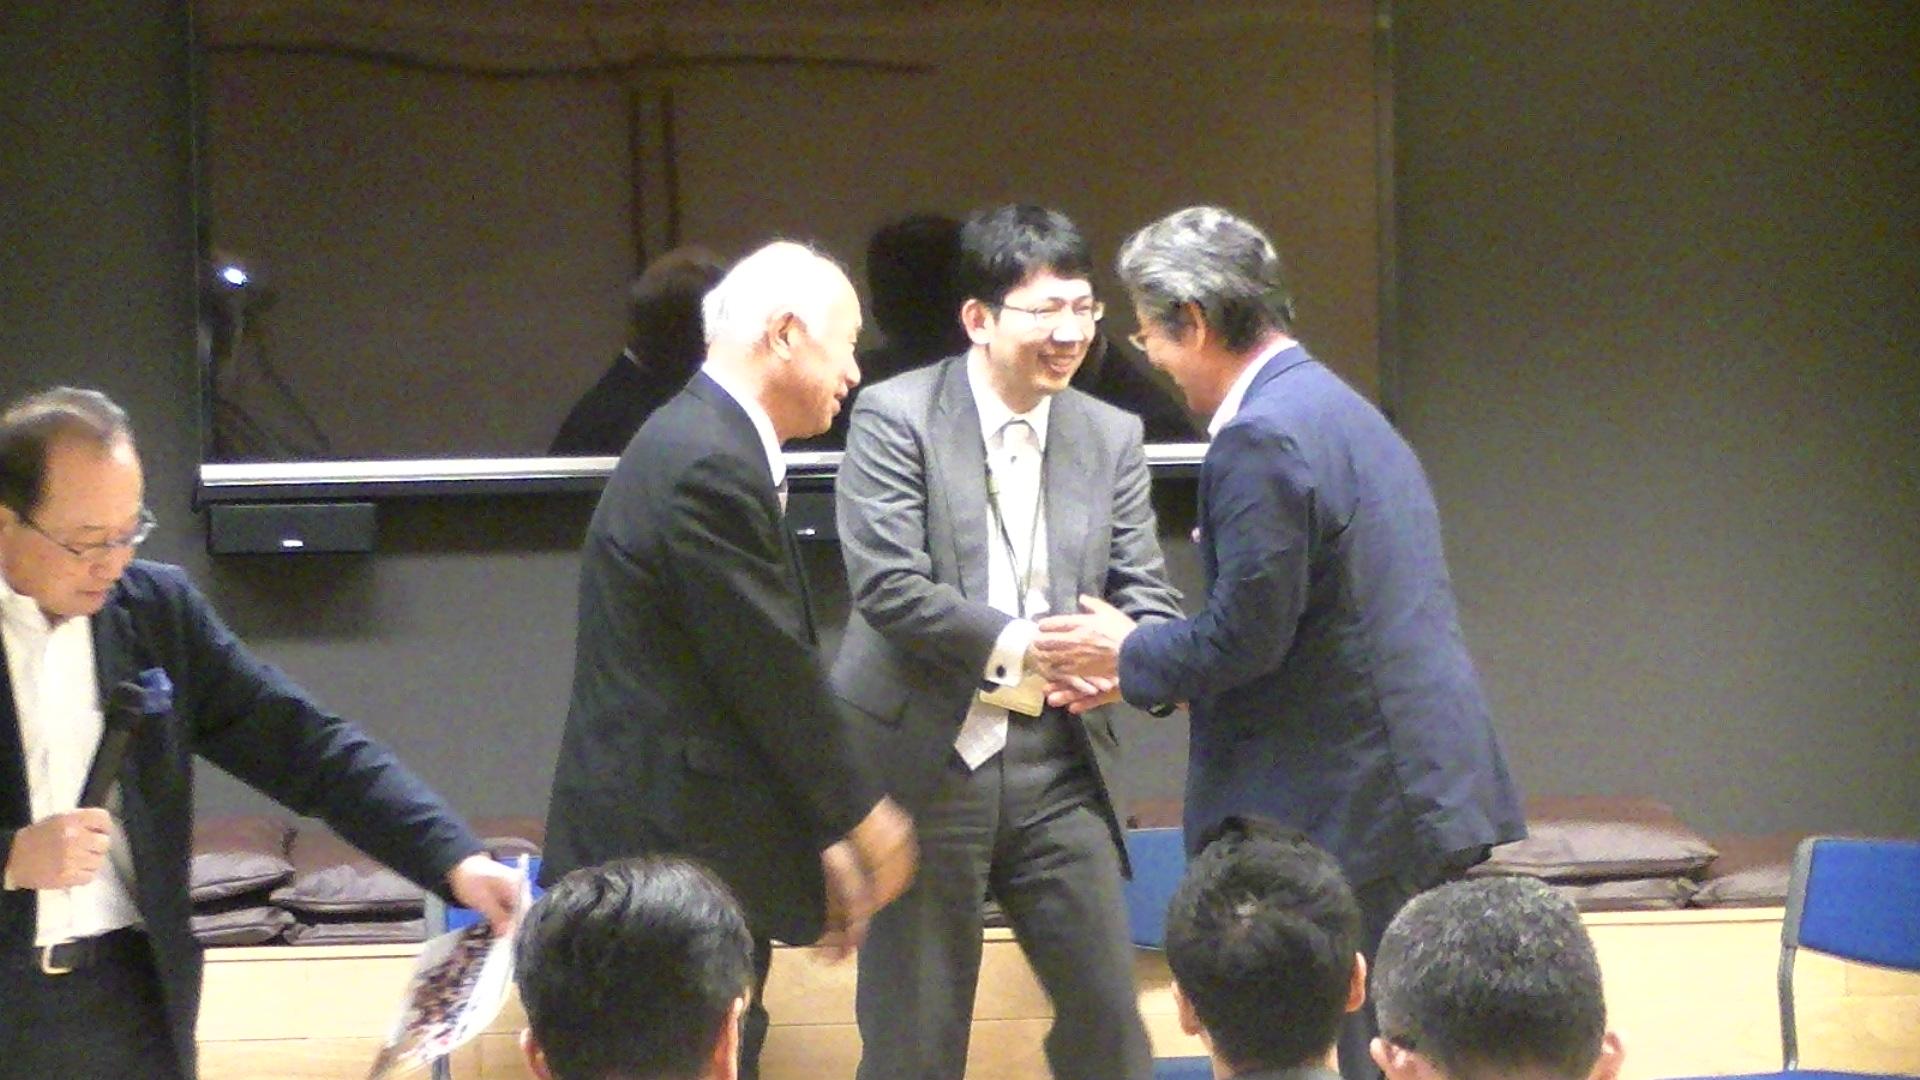 PIC 0048 - 4月1日東京思風塾の開催になります。